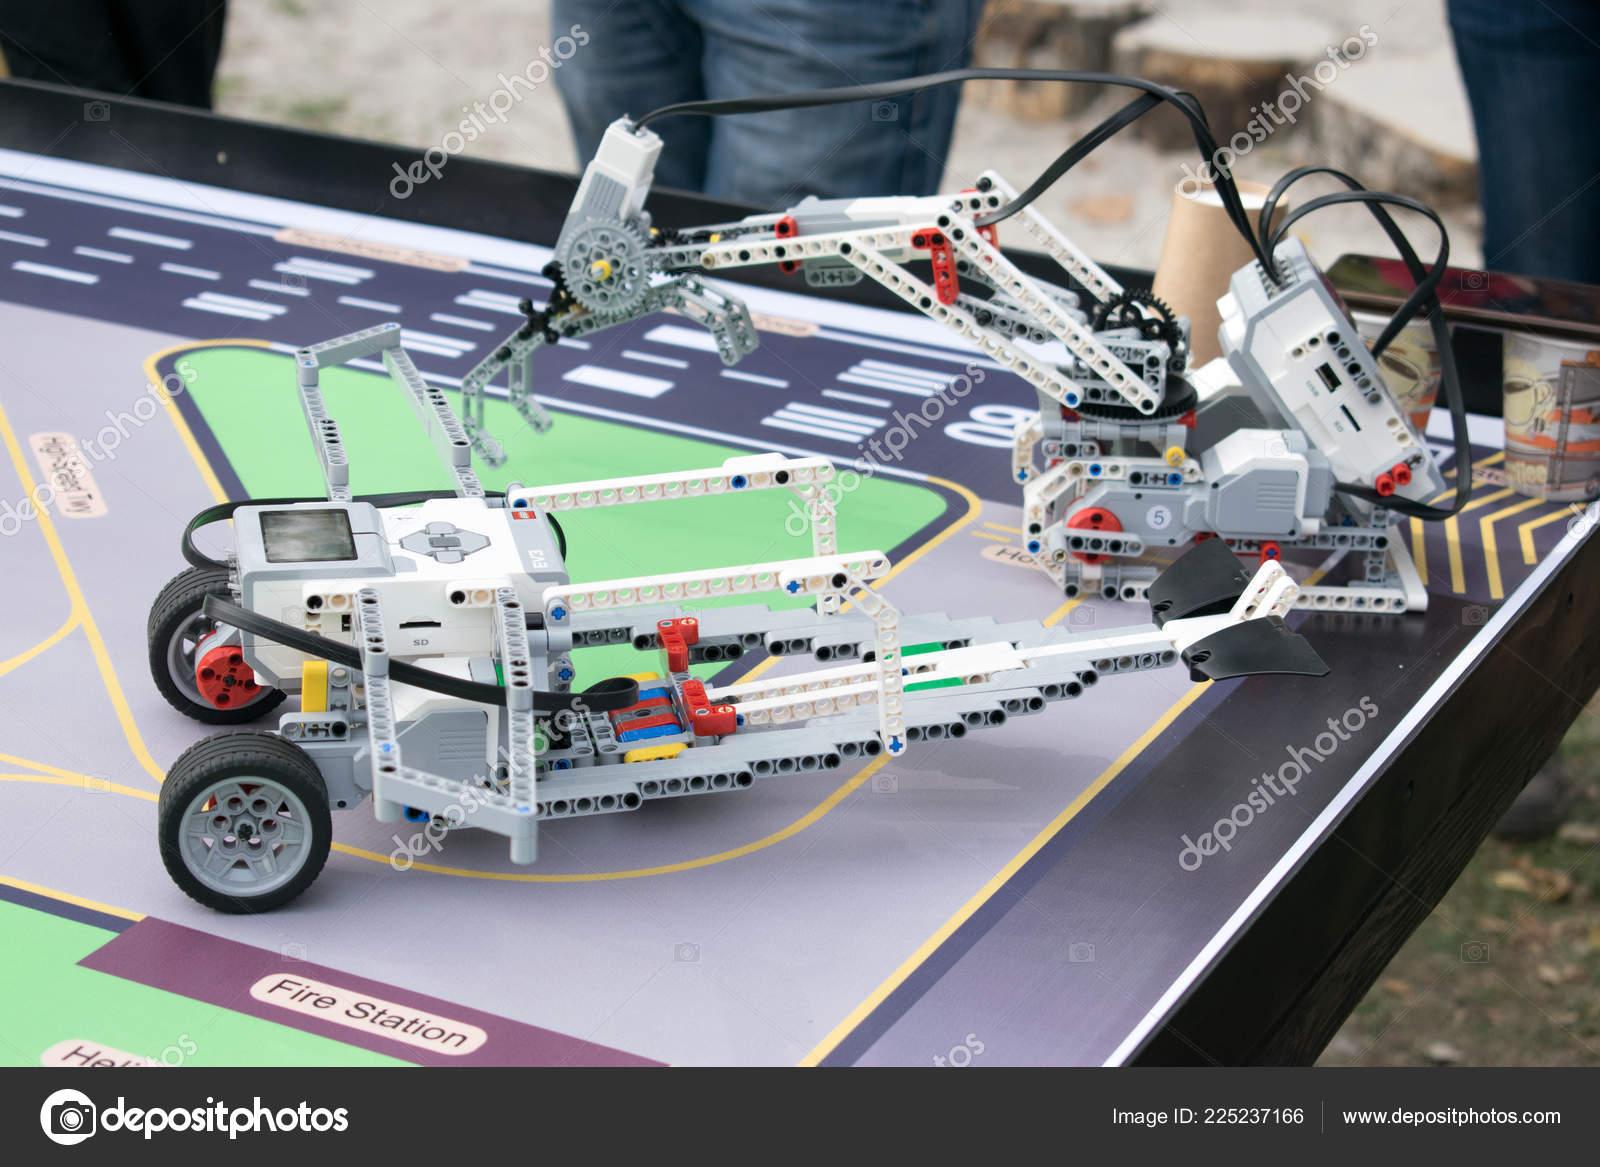 Robotics Lessons Boys Girls Construct Programming Code Robot